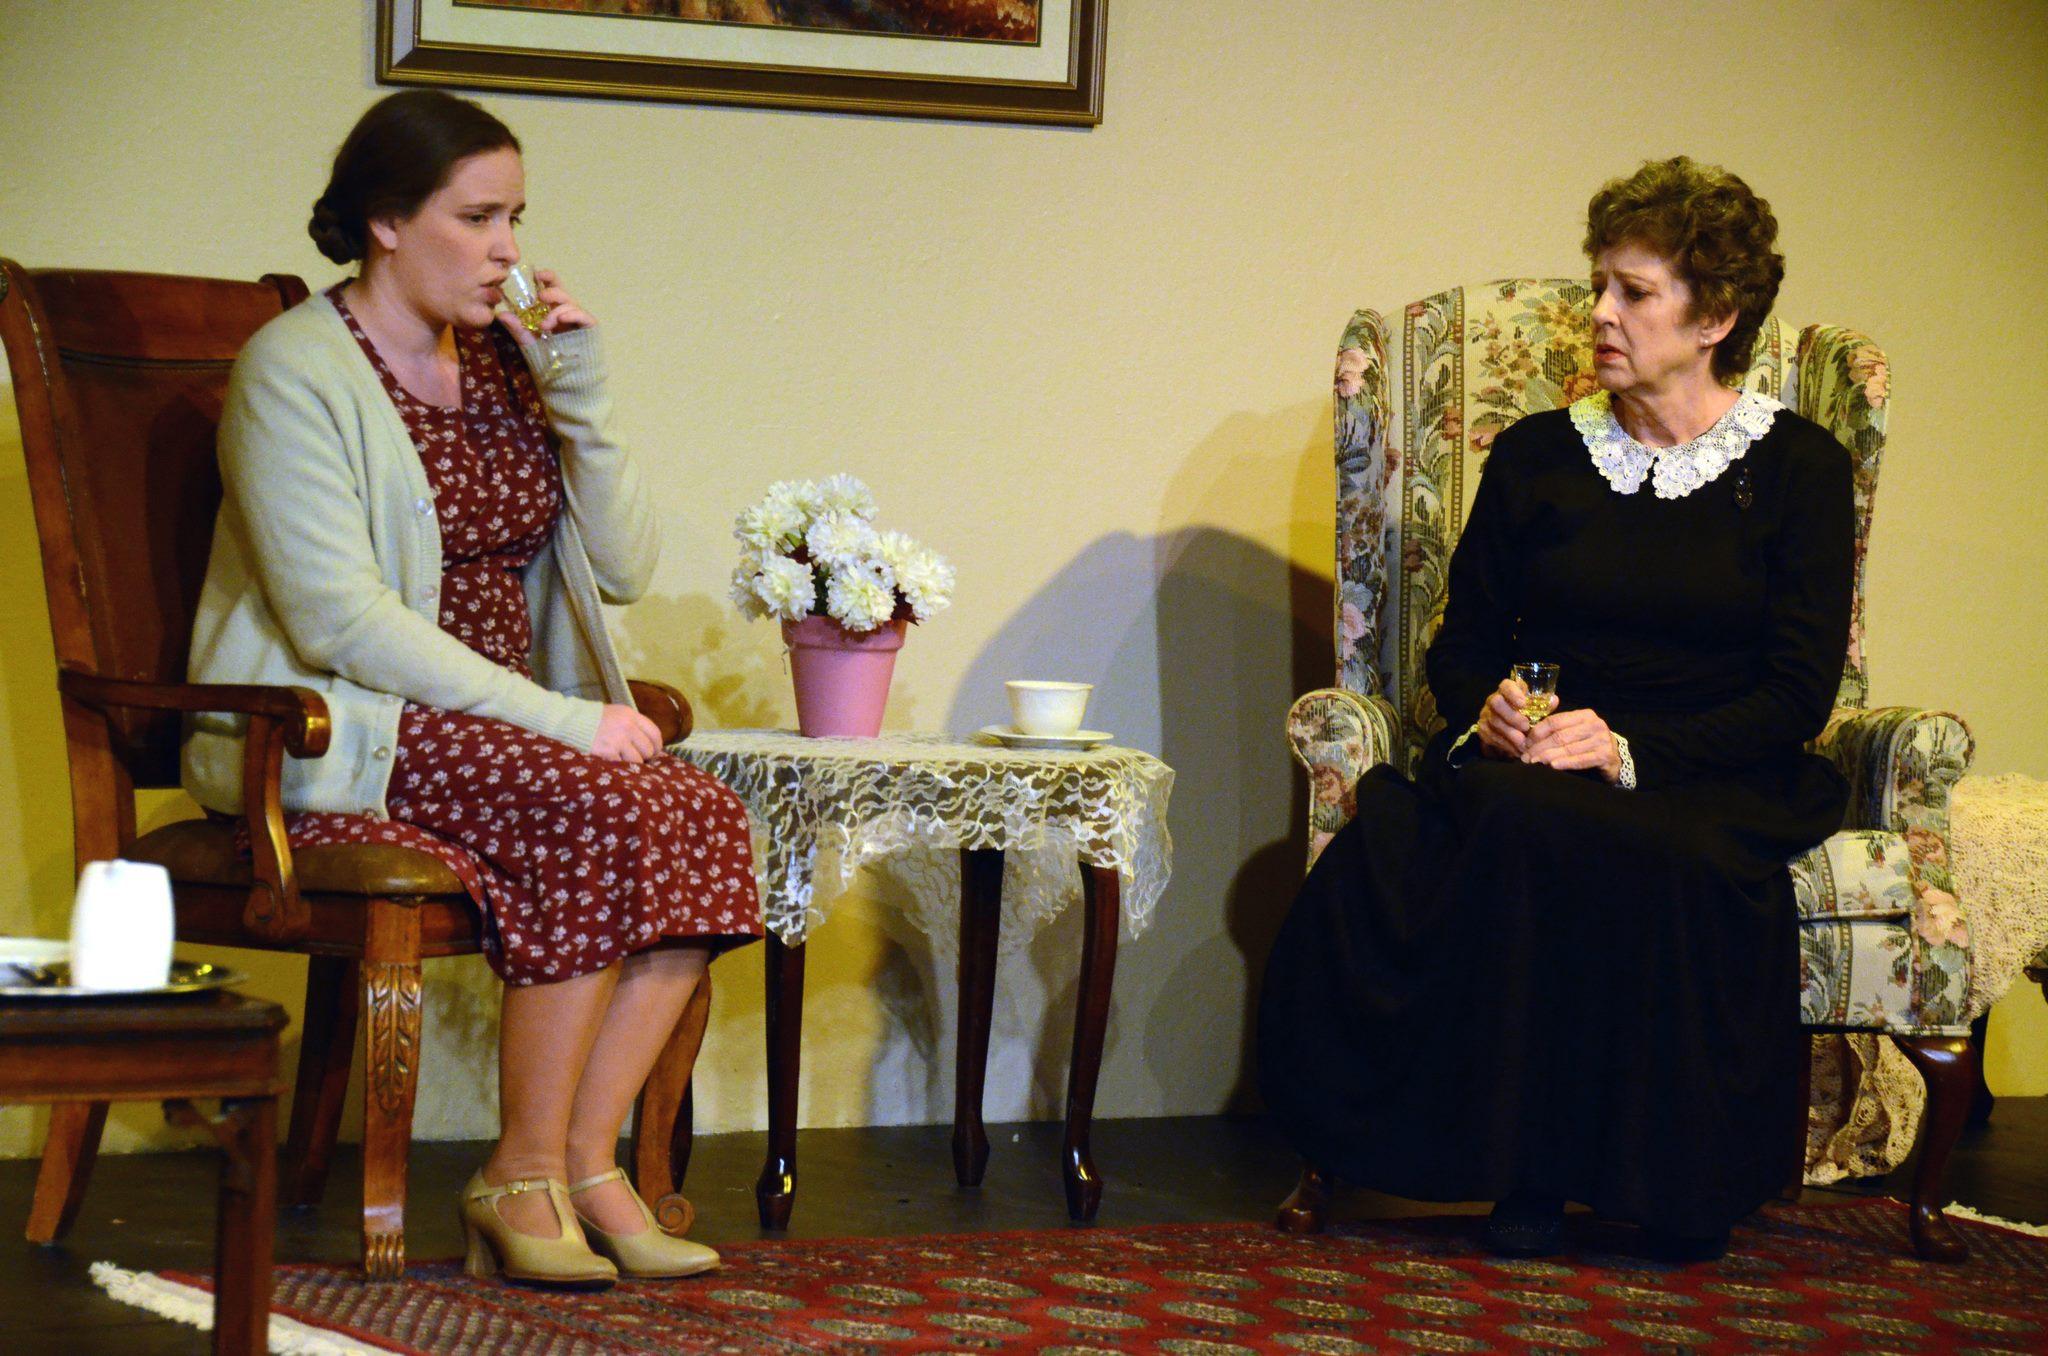 "Amanda Noel Trombley and Barbara Acker in ""Mrs. Klein"" at Theatre Artists Studio, 2013. (Photo by Mark Gluckman)"